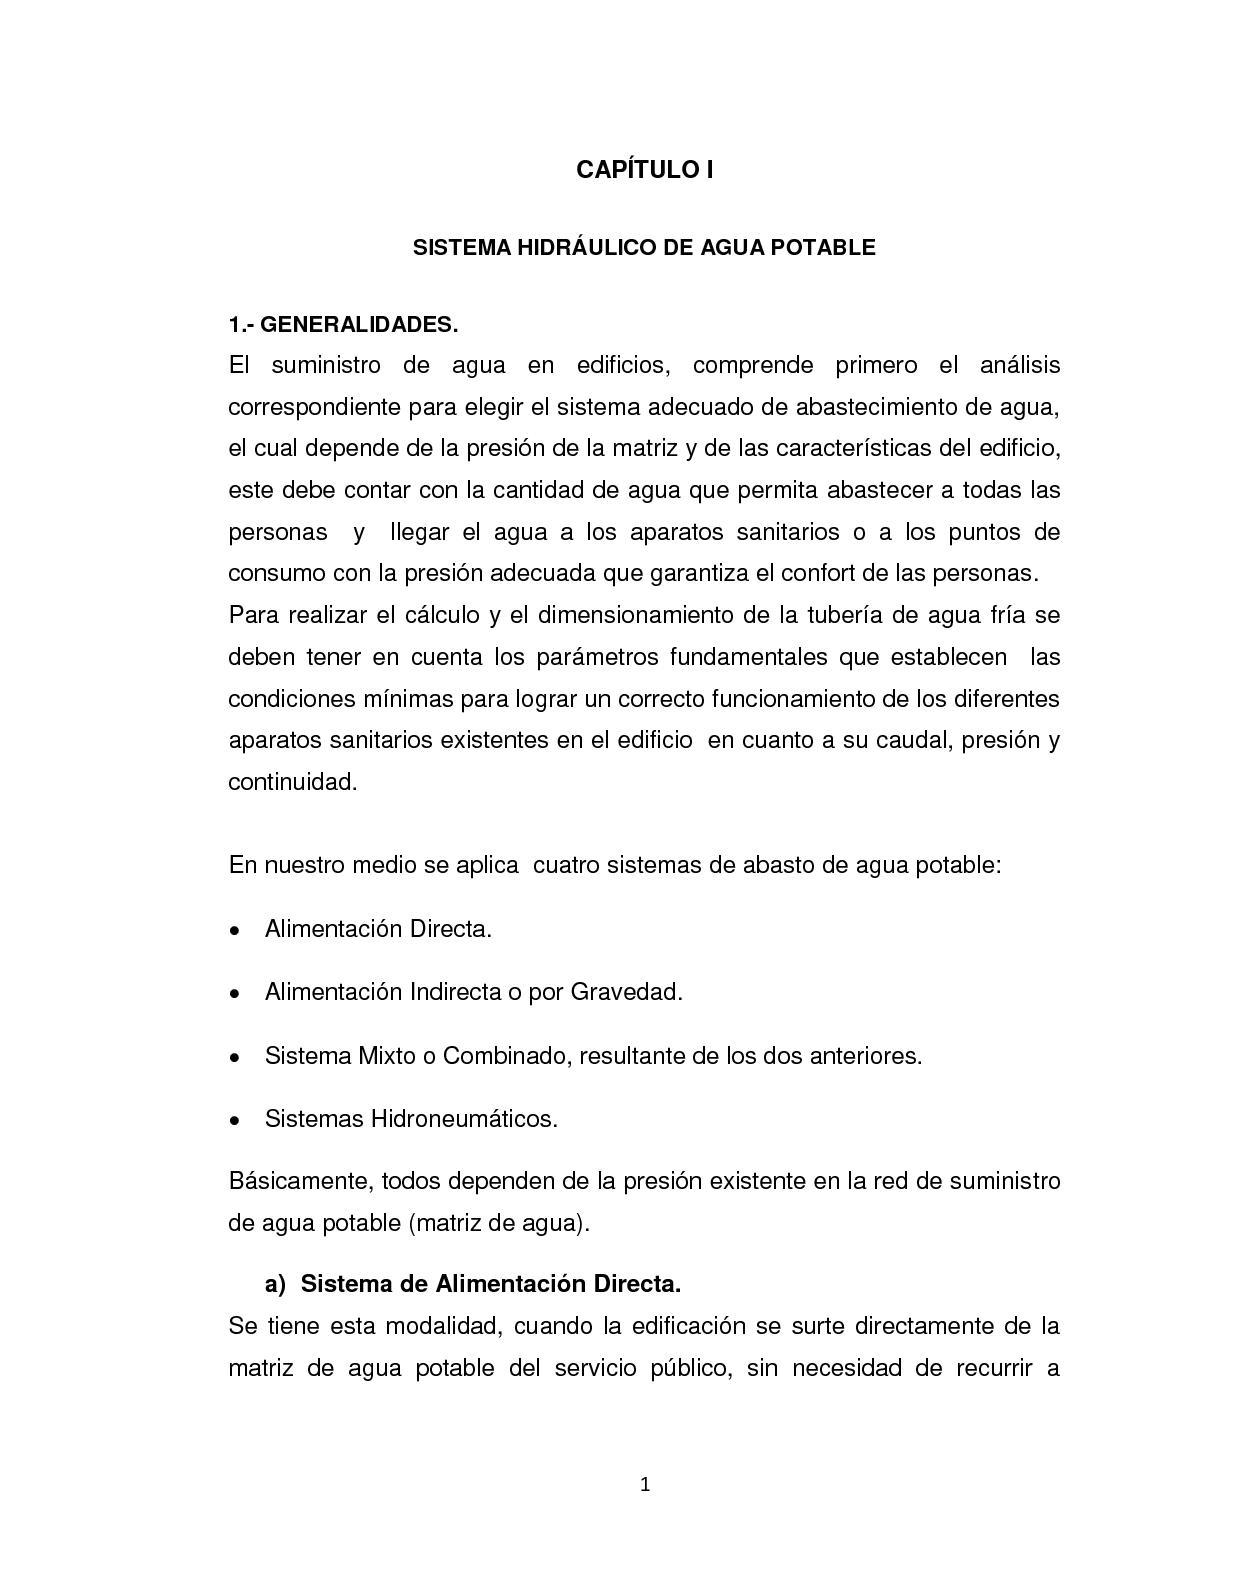 Circuito Hidraulico Mixto : Calaméo astudillo g juan c